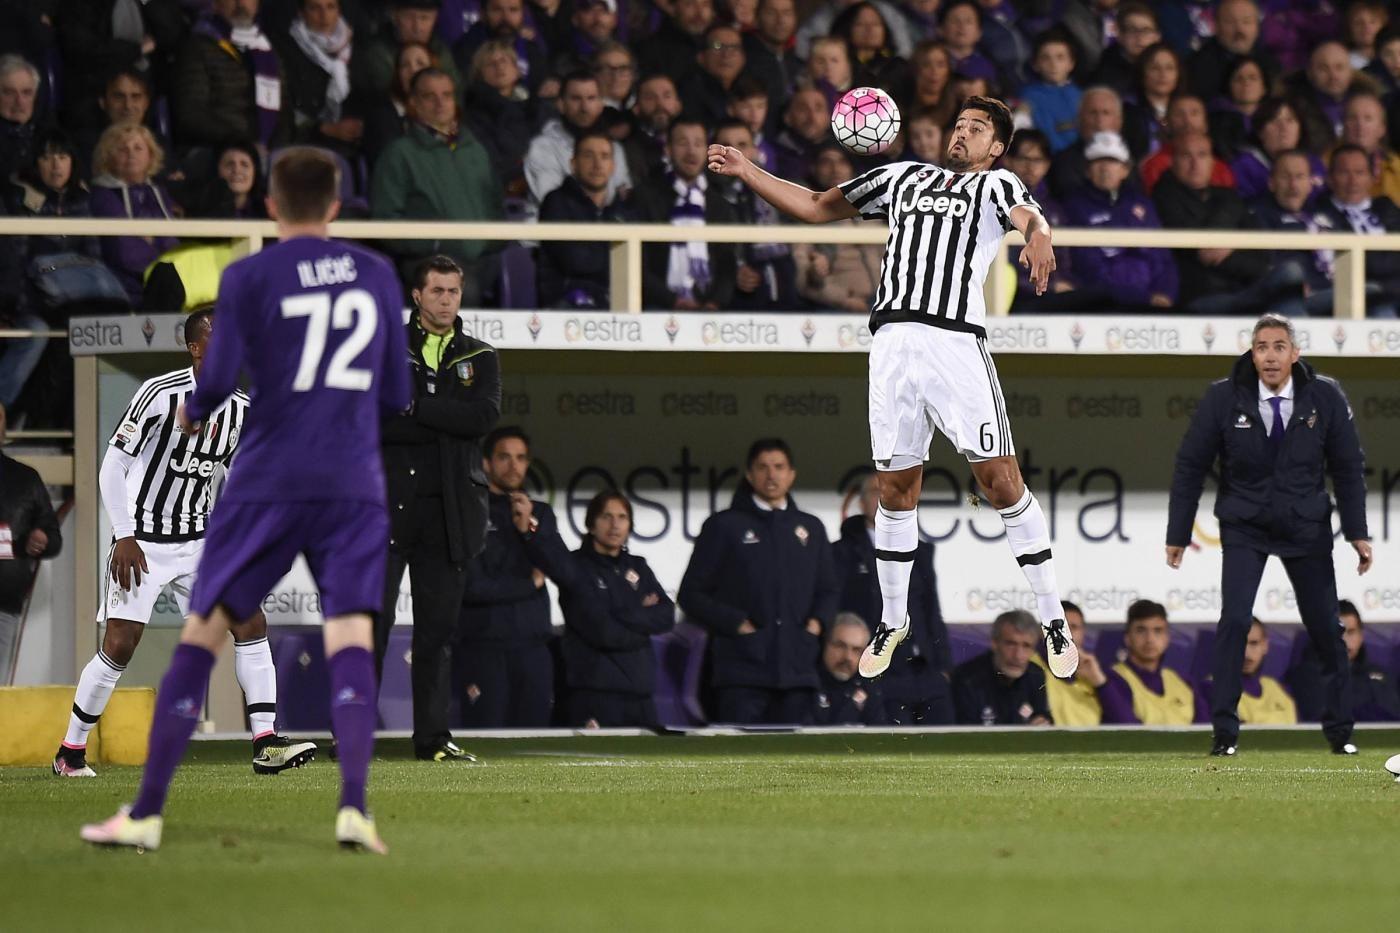 Fiorentina - Juventus 1 - Sportmediaset - Foto 18